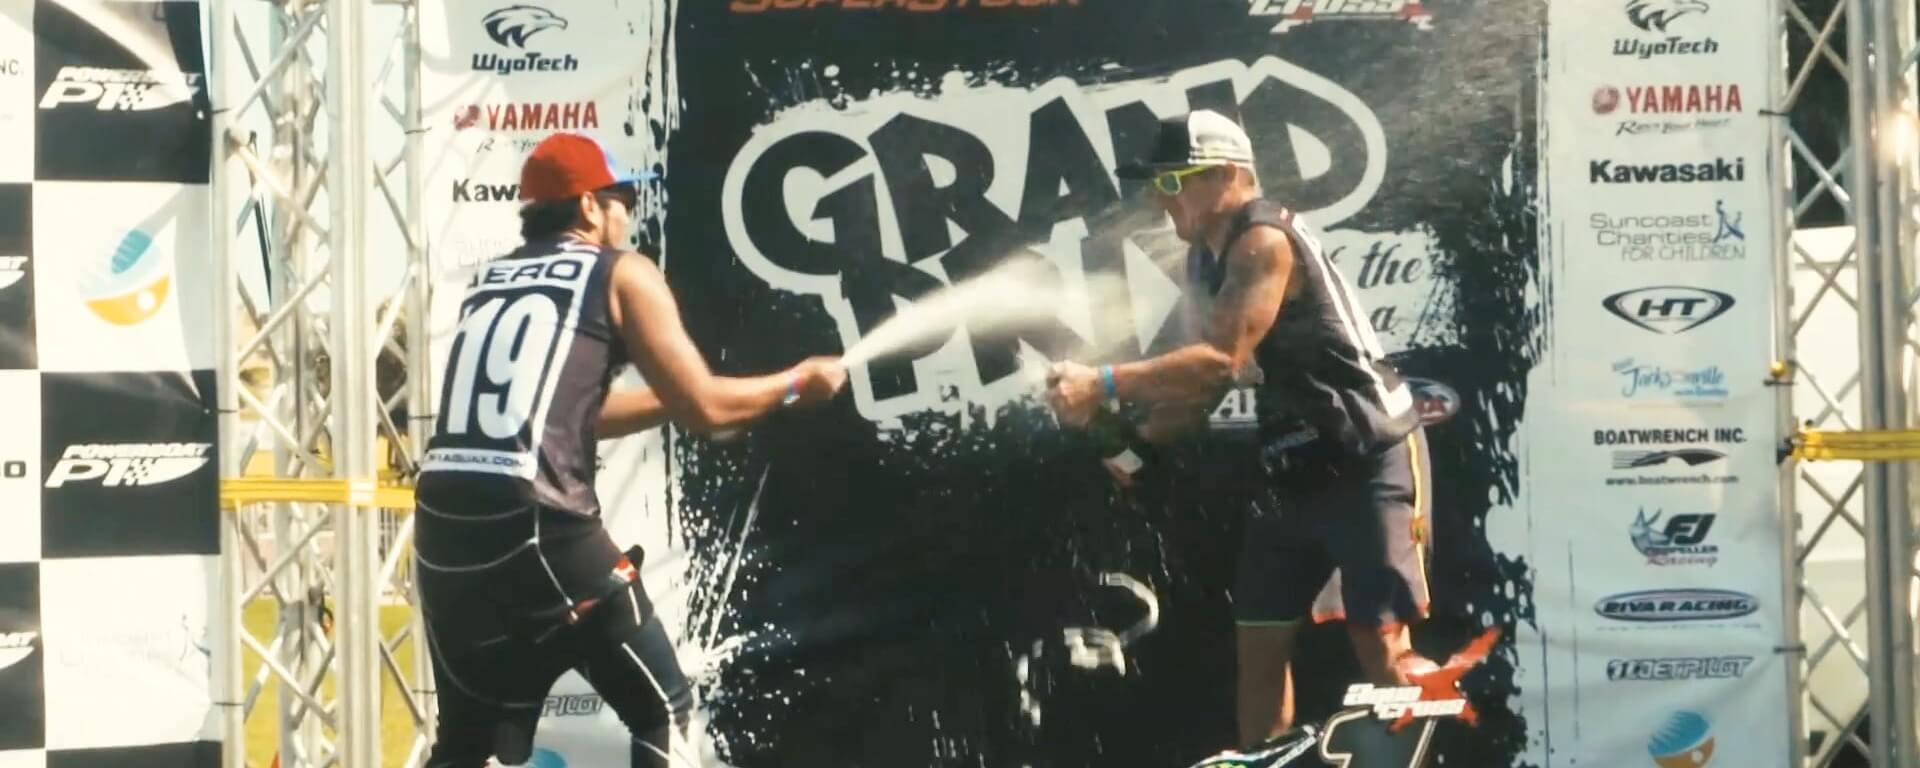 Powerboat P1 Grand Prix of the Seas